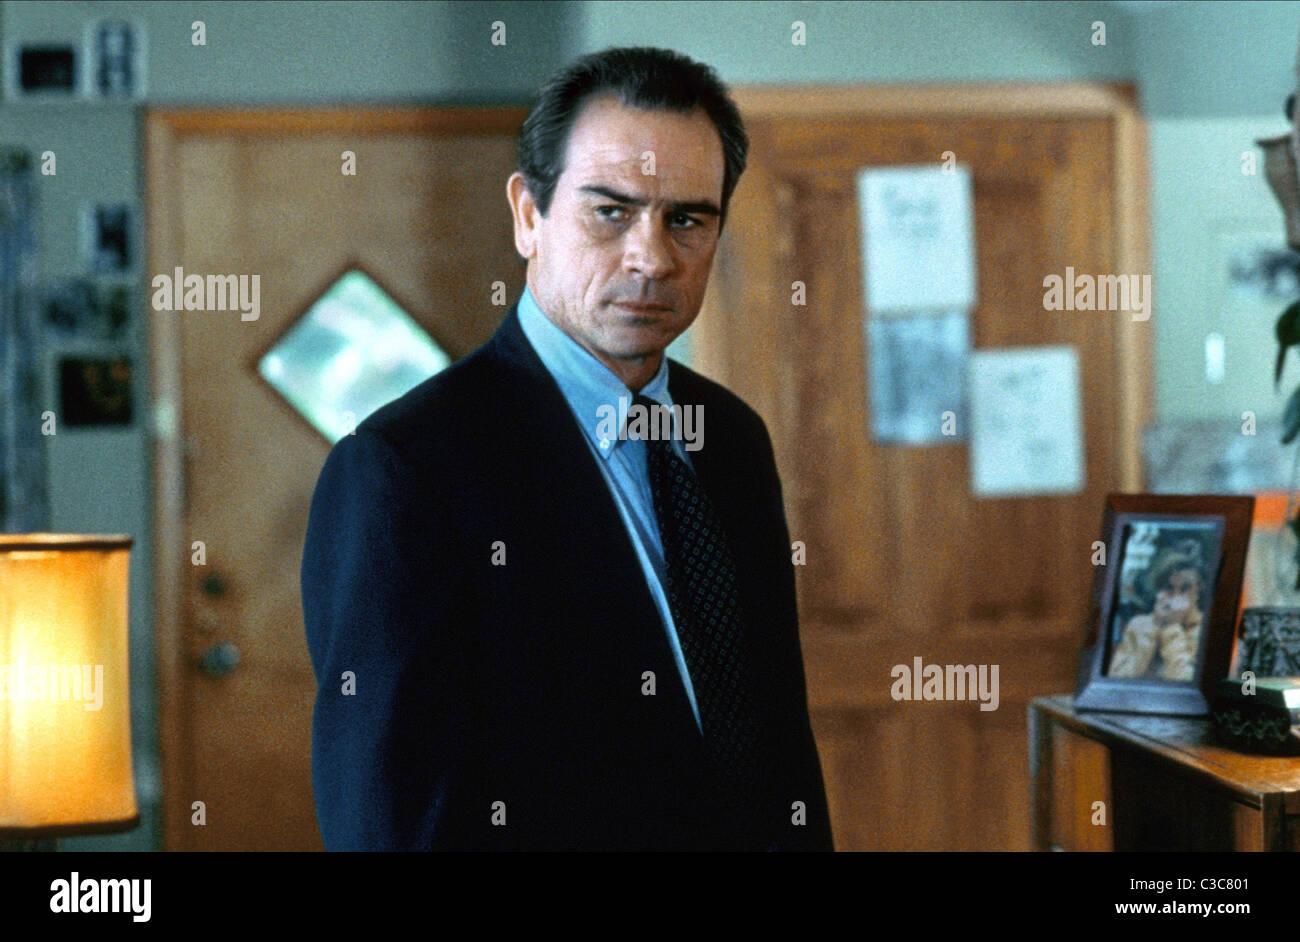 Tommy Lee Jones U S Marshals 1998 Stock Photo Alamy